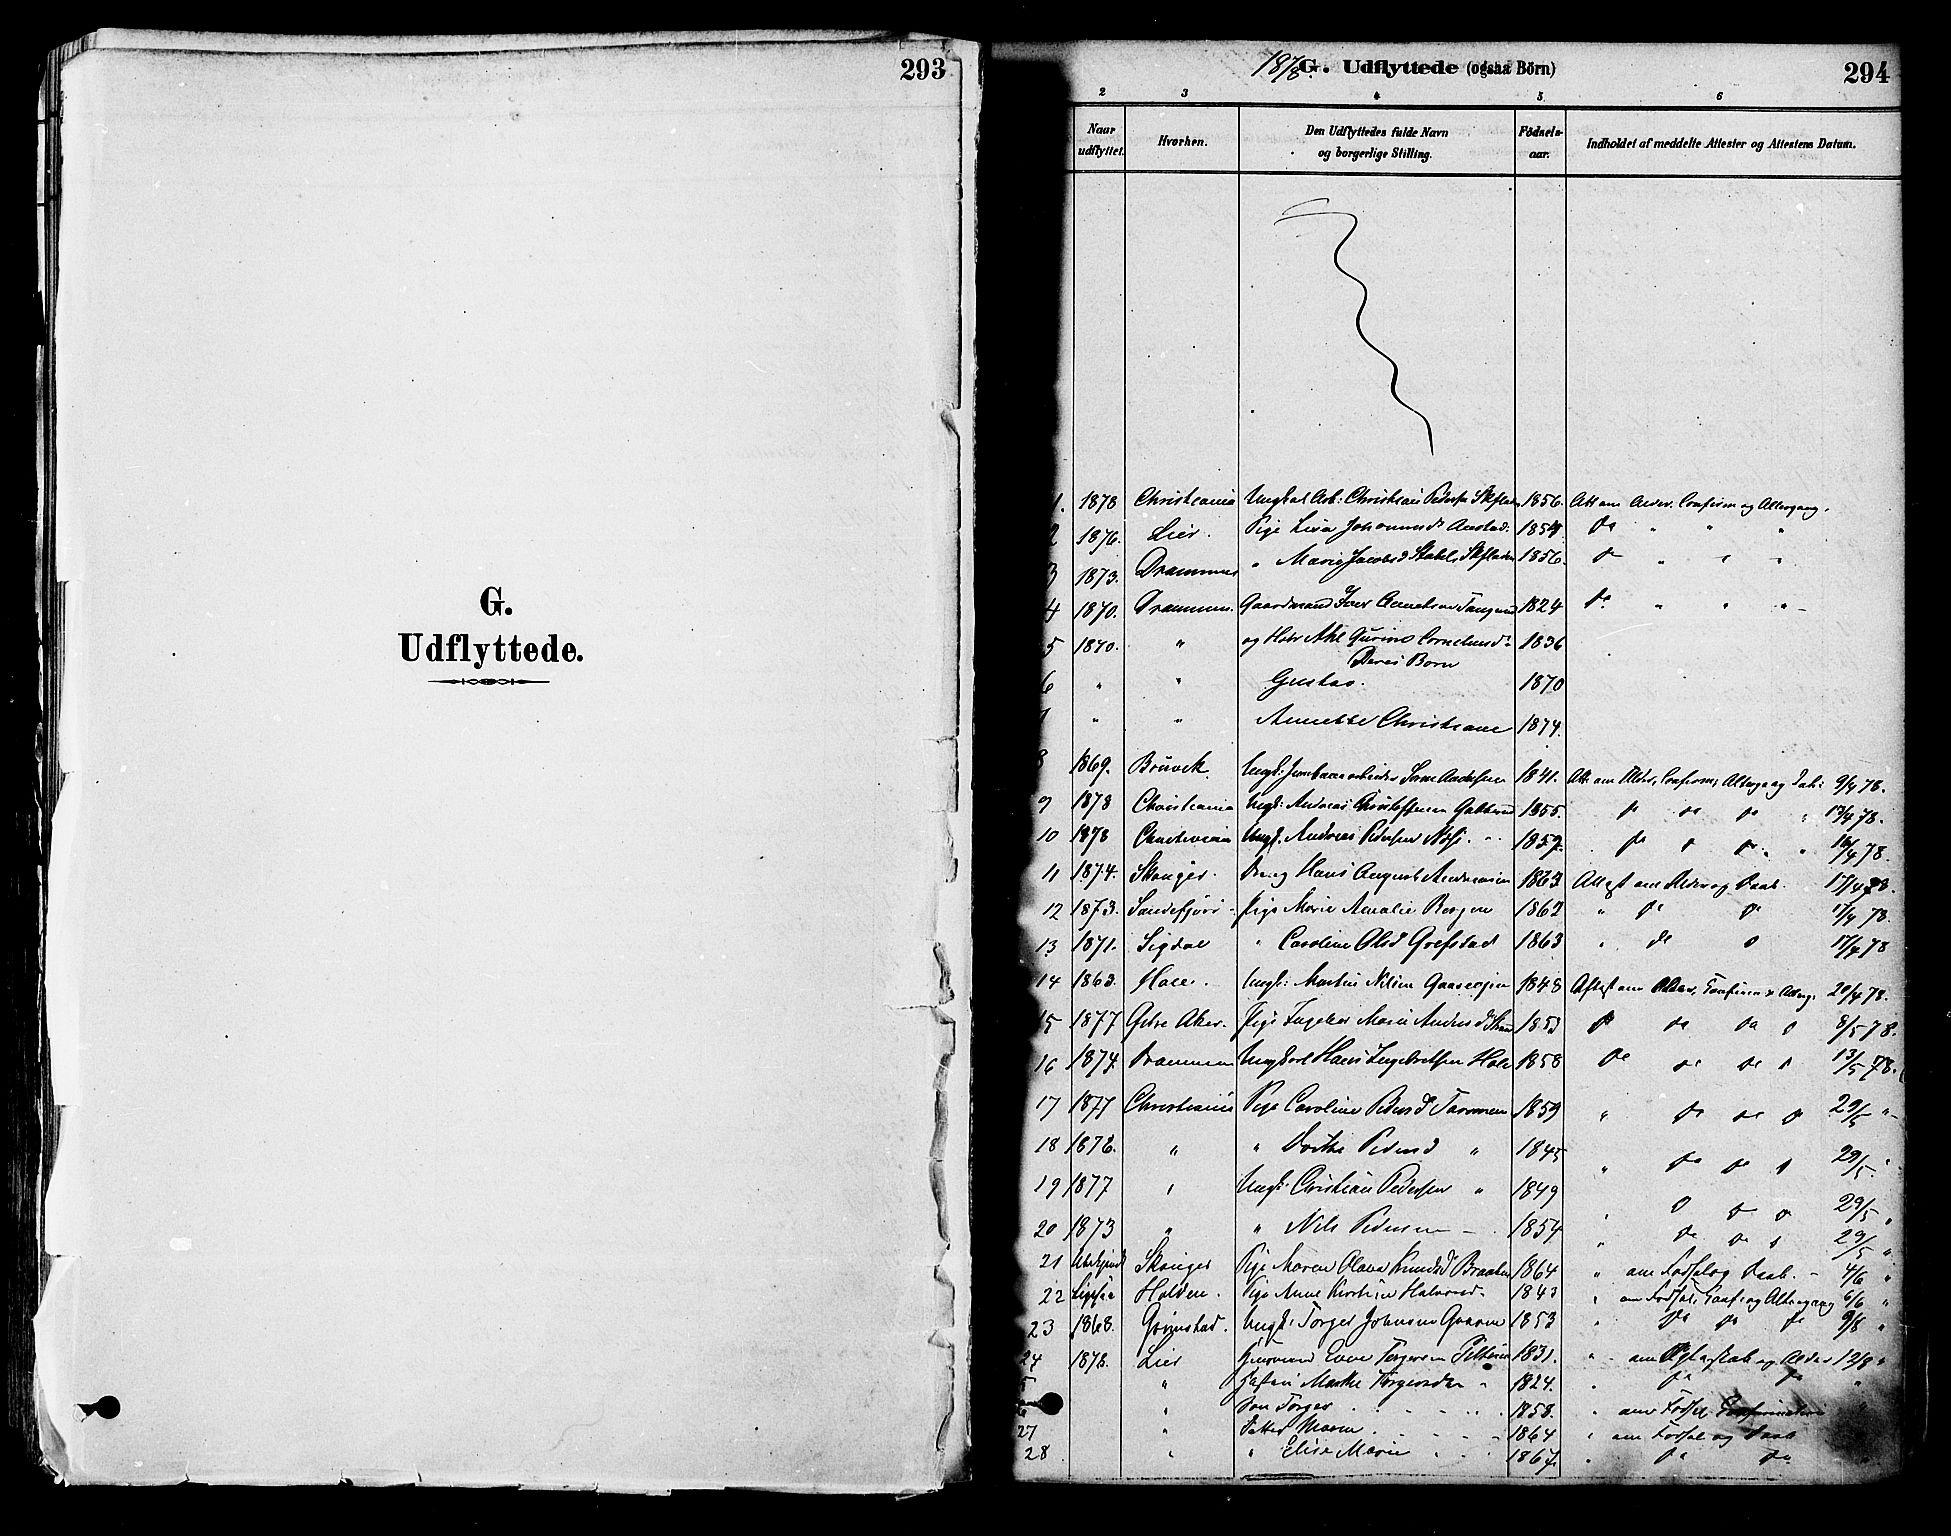 SAKO, Modum kirkebøker, F/Fa/L0011: Ministerialbok nr. 11, 1877-1889, s. 294